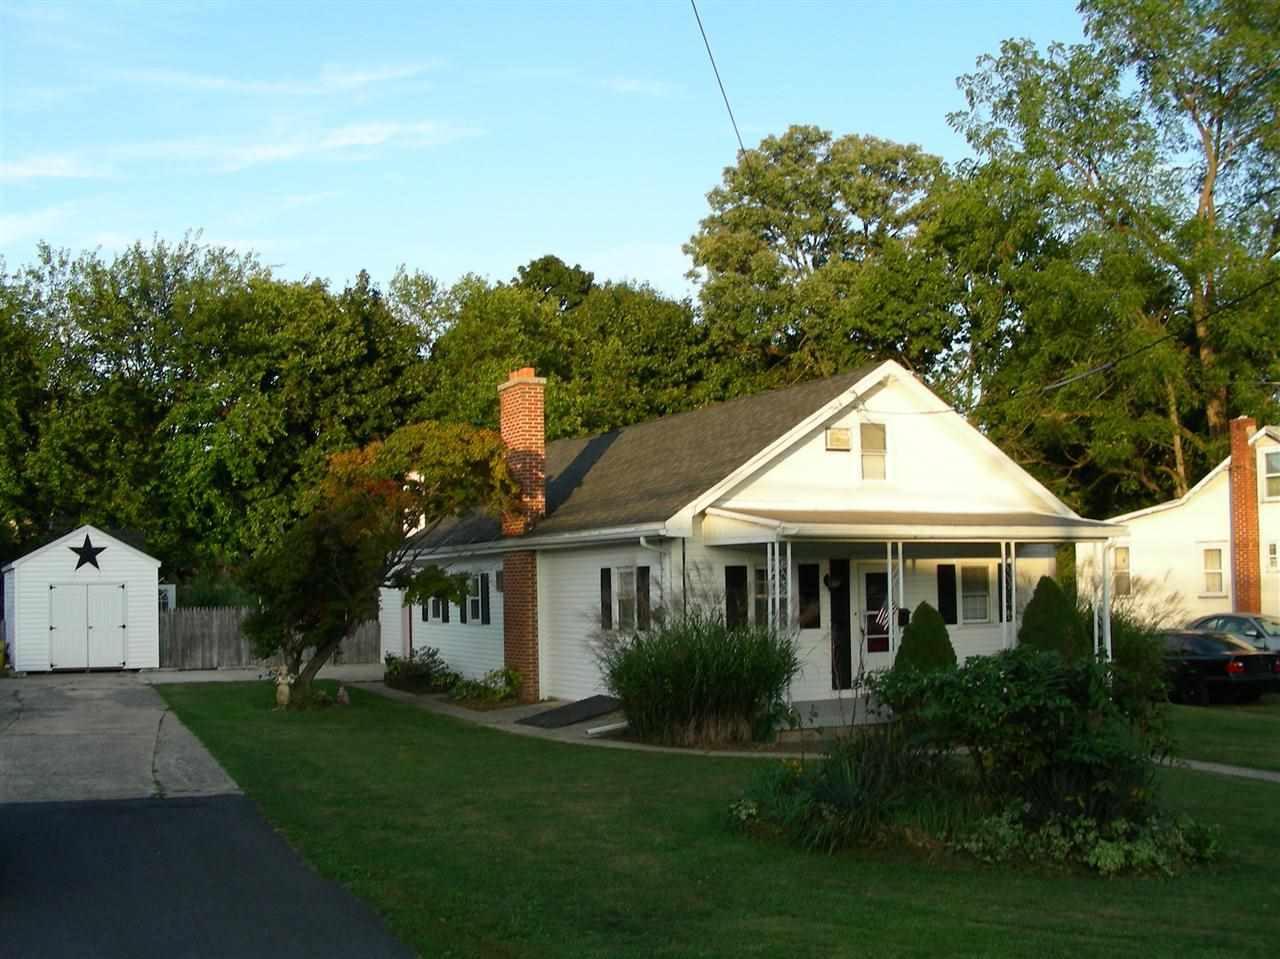 1123 Rana Villa Ave, Camp Hill, PA 17011